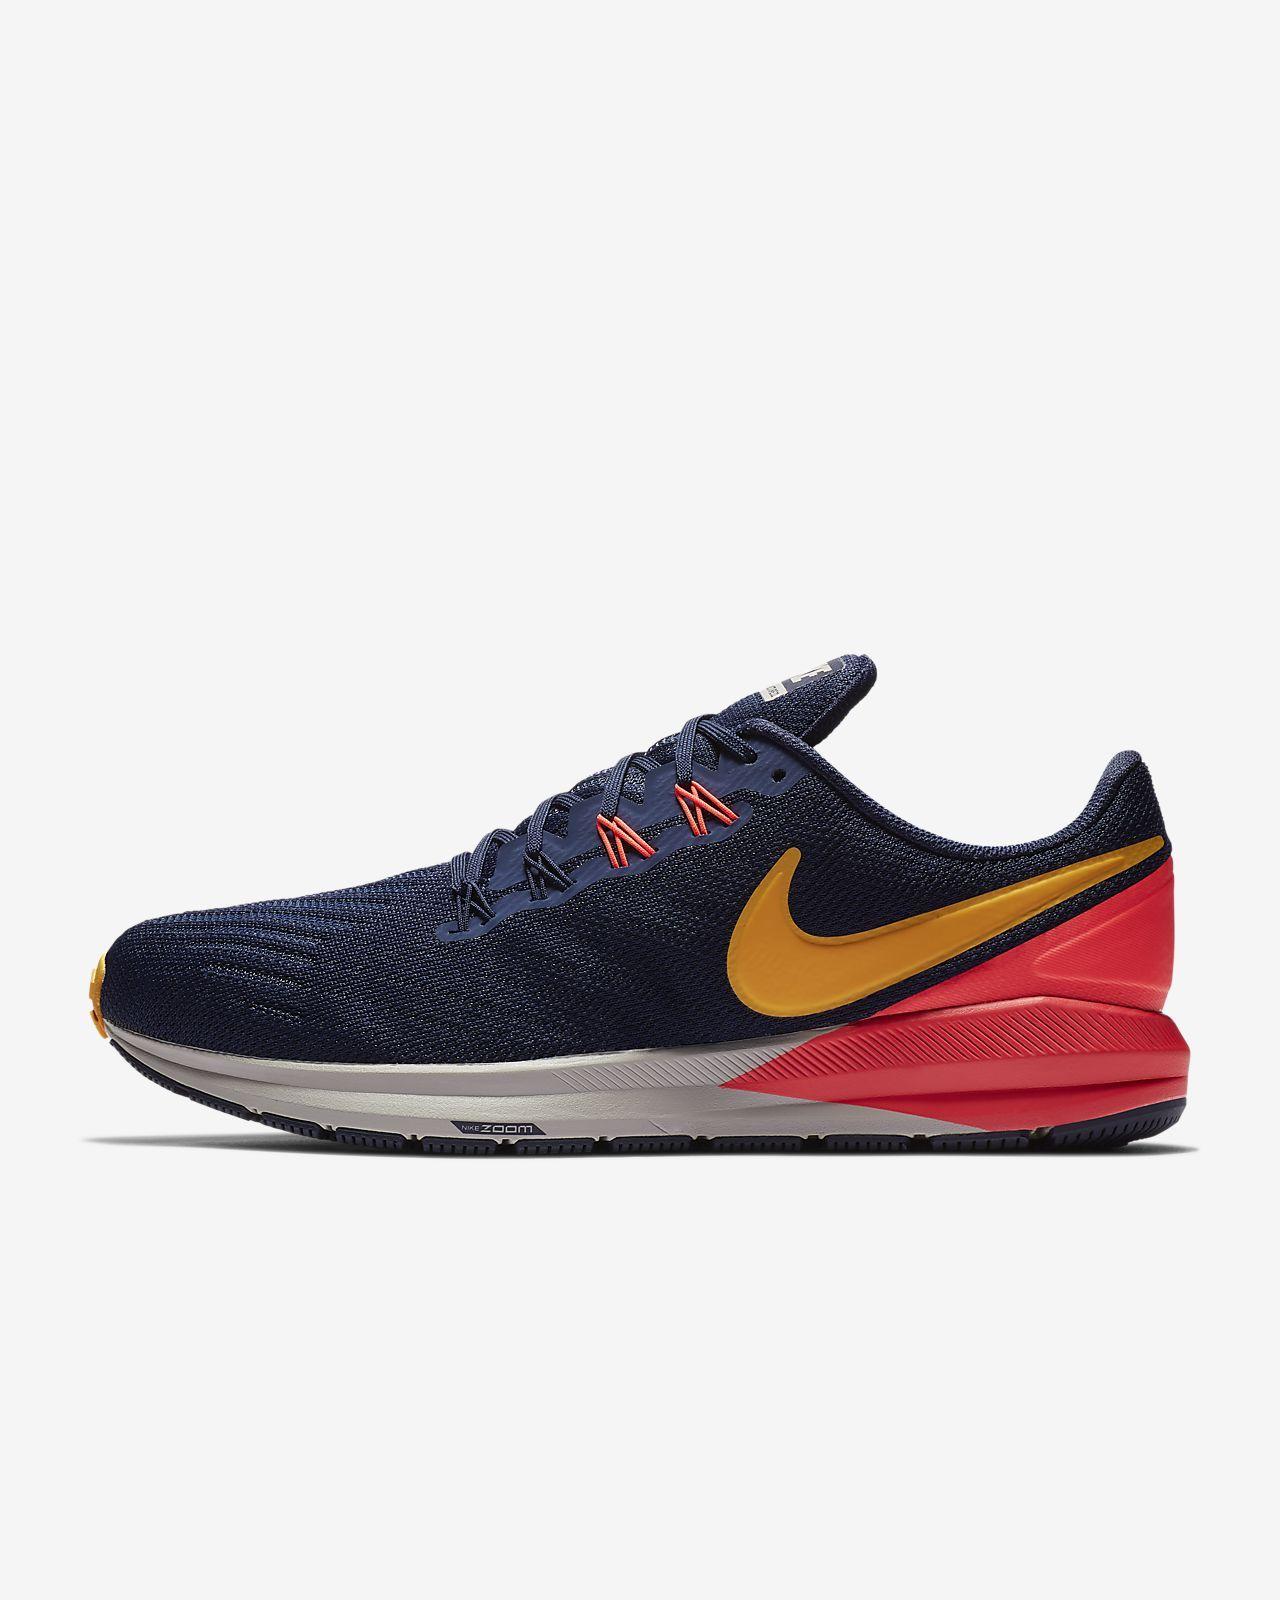 Air Zoom Structure 22 Men's Running Shoe Nike running